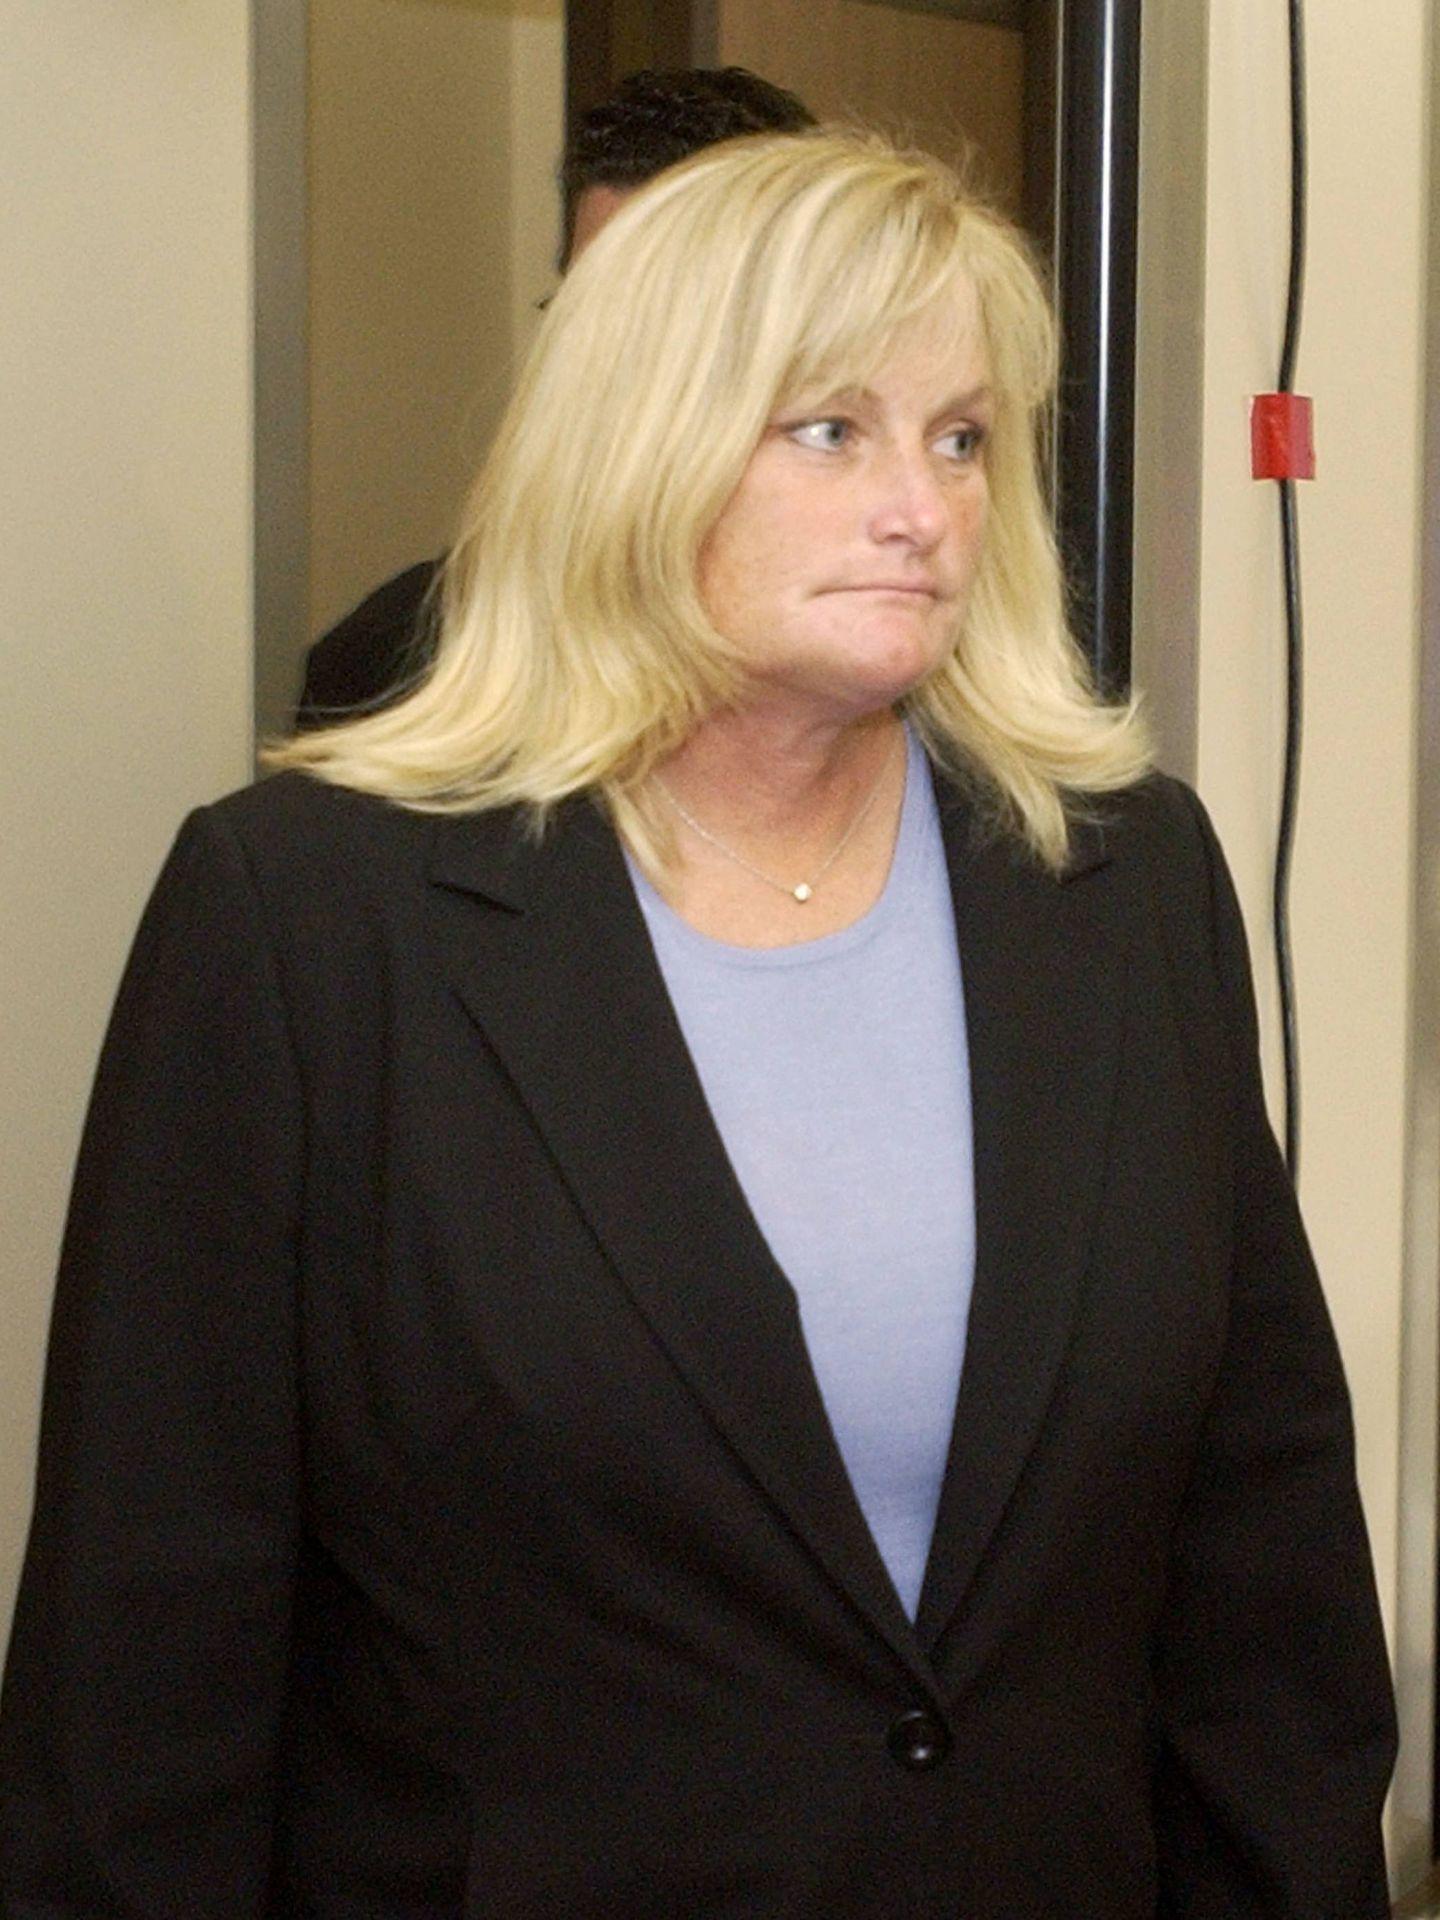 Debbie Rowe. (Getty)